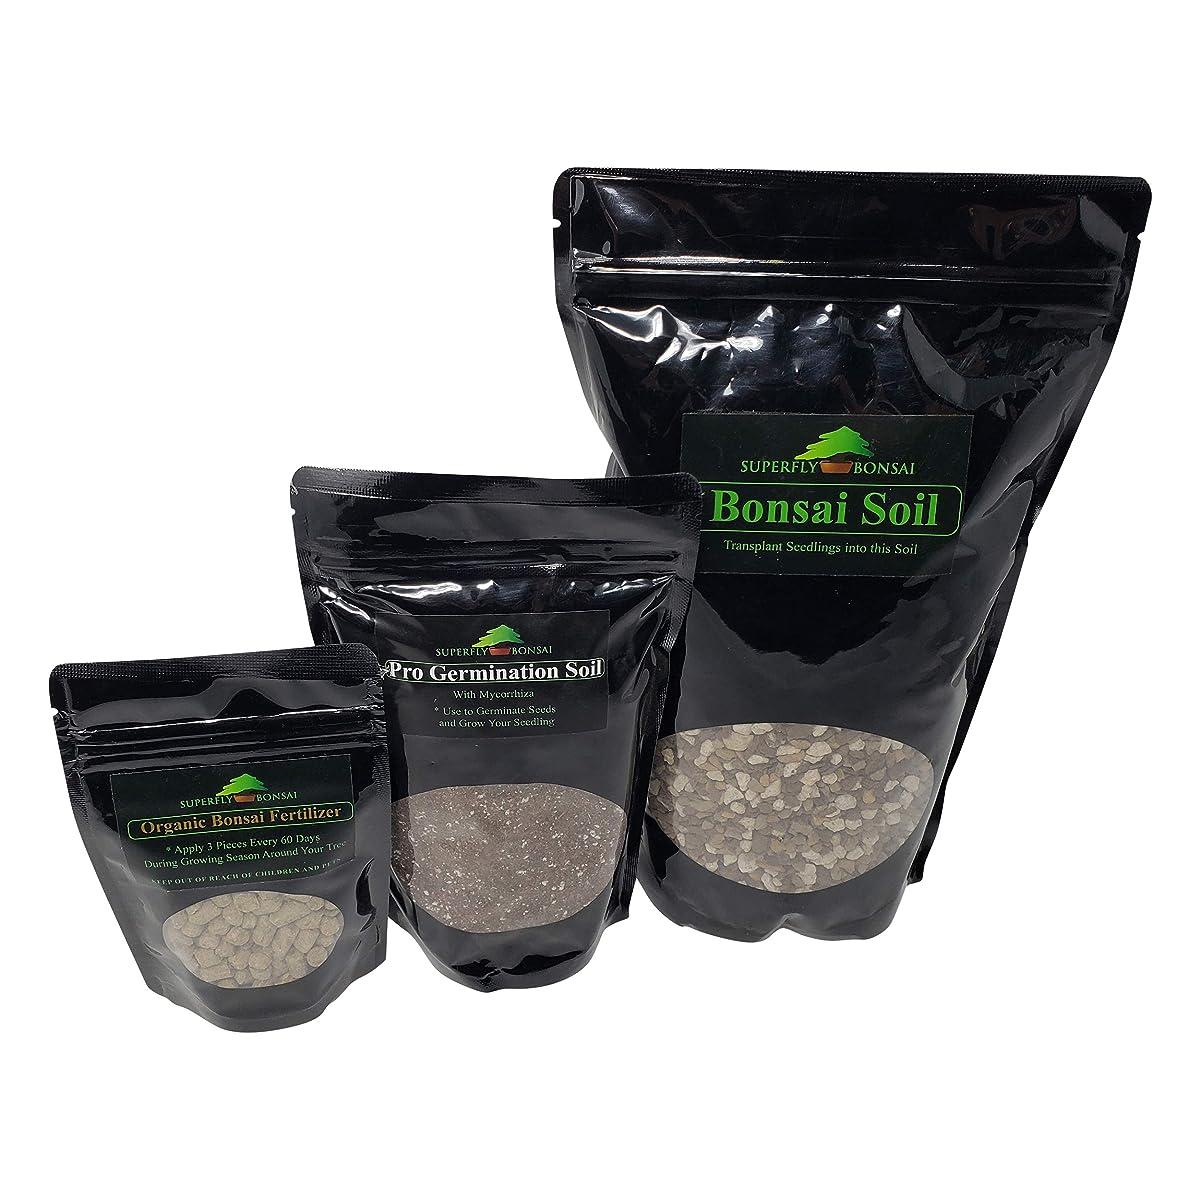 New Chili Bonsai Premium Bonsai Tree Starter Seed Kit - Bonchi Hot Peppers (Chili Bonsai Kit Level 2)